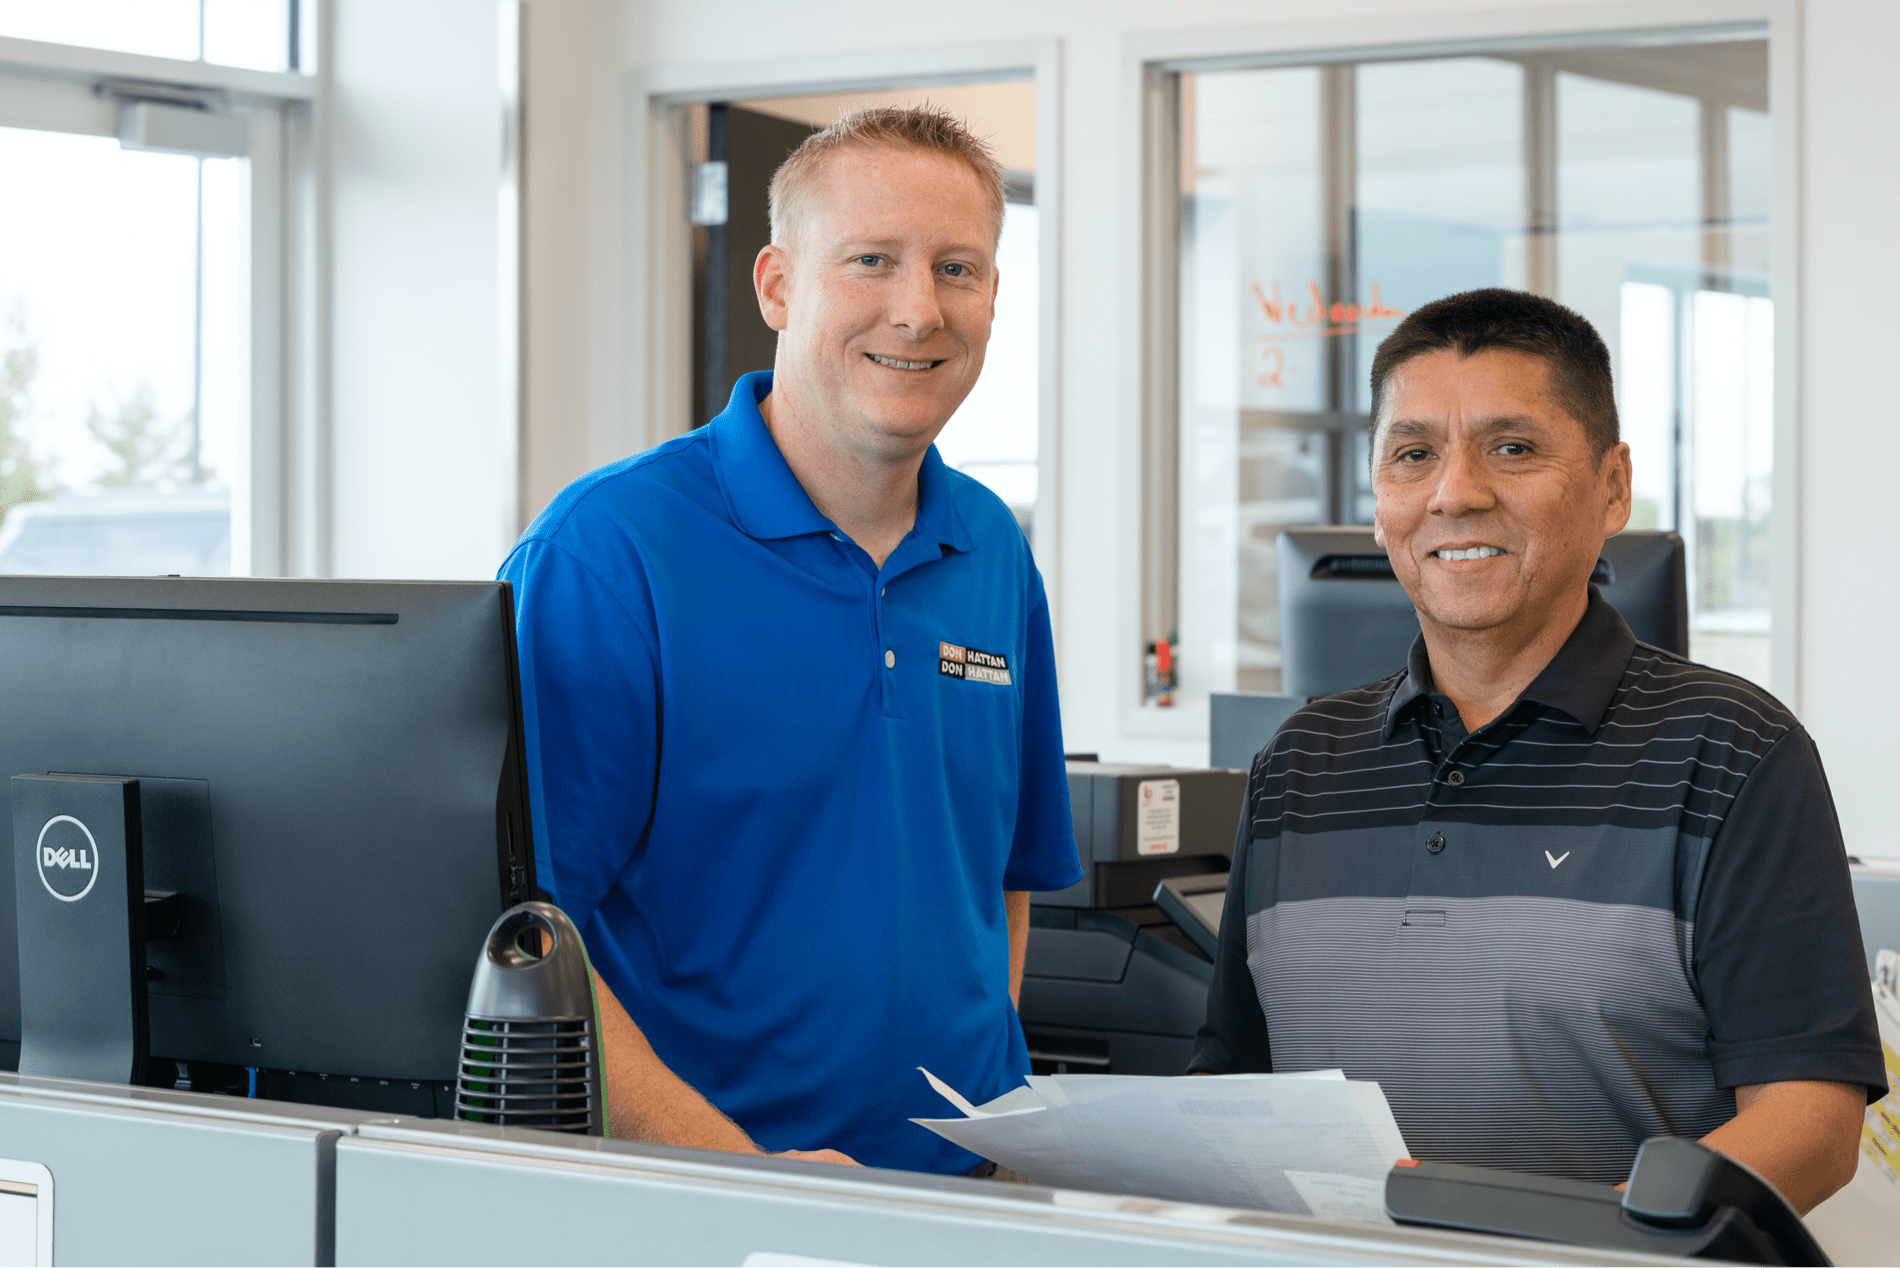 Finance salesman meets with customer